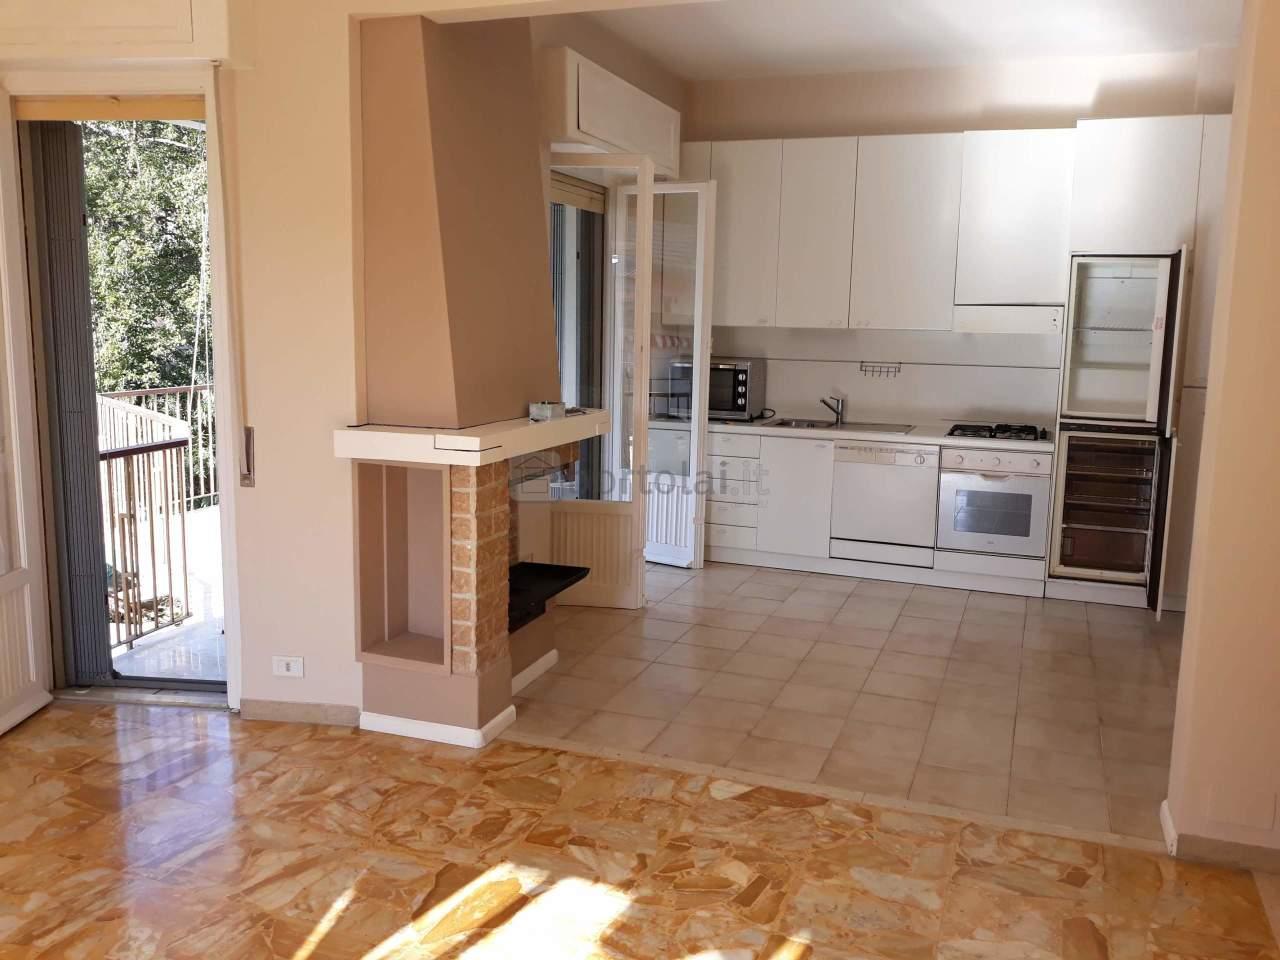 Appartamento, 80 Mq, Vendita - Genova (GE)